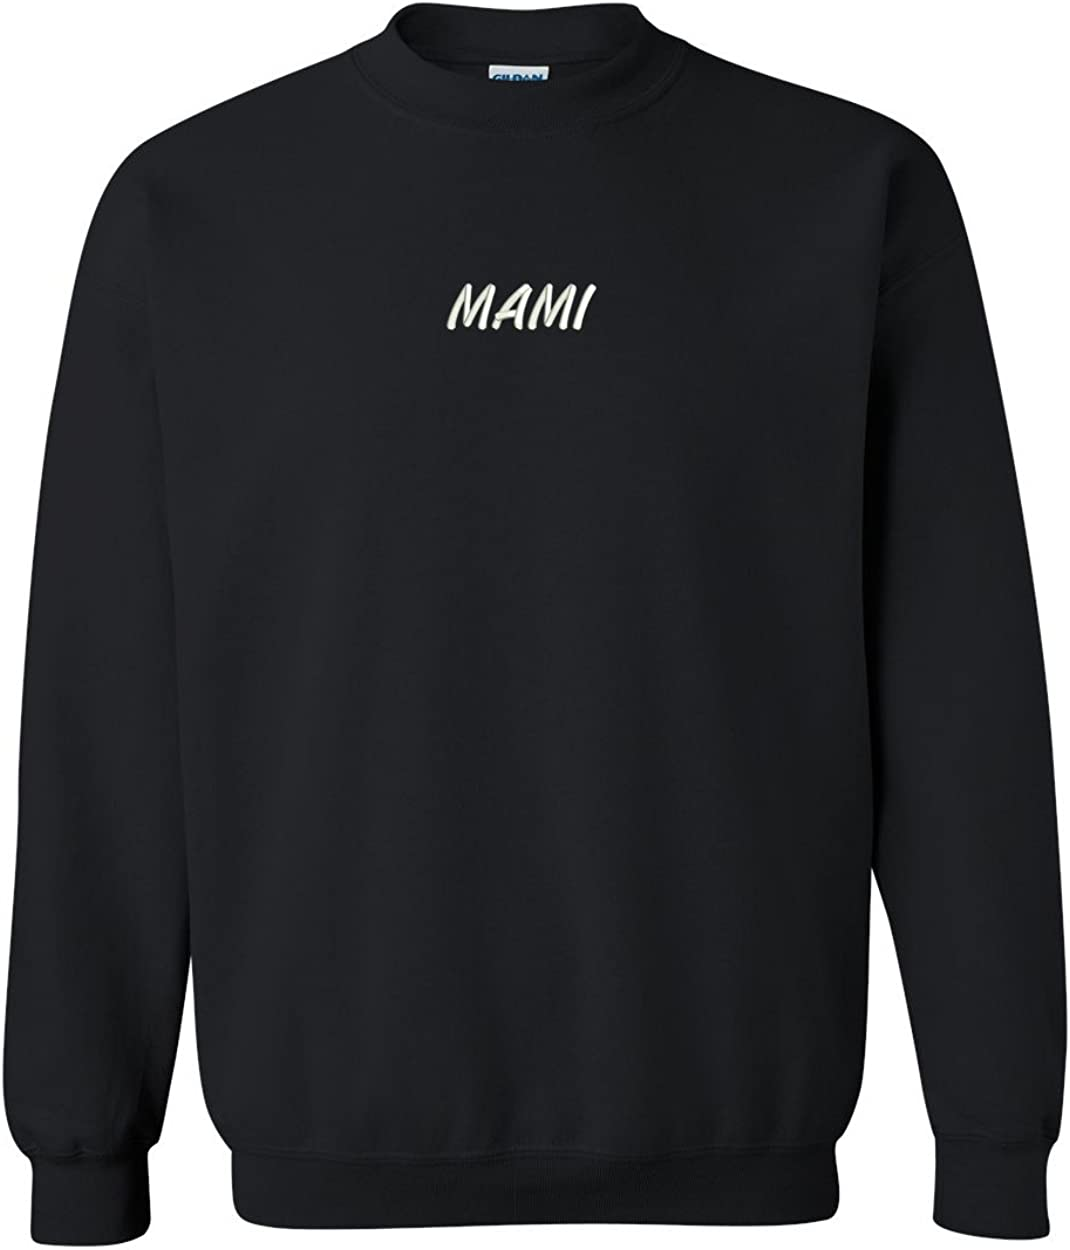 Trendy Apparel Shop Mami Embroidered Crewneck Sweatshirt